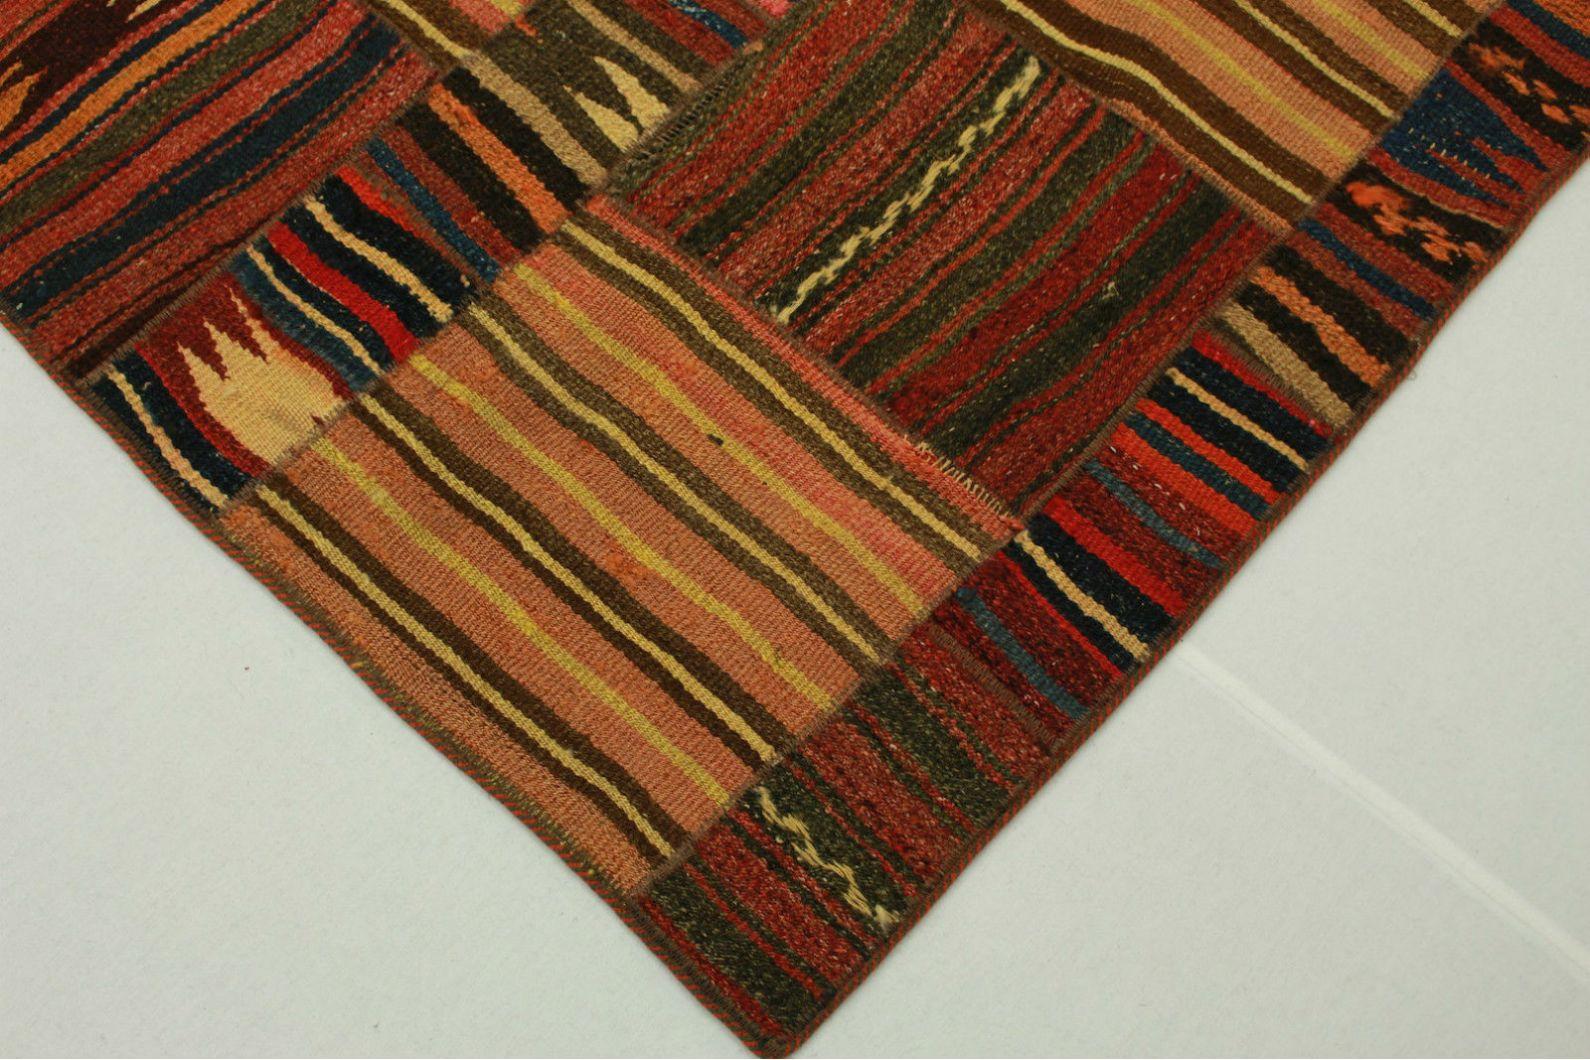 kelim patchwork teppich braun rosa in 250x170cm 1001 2203. Black Bedroom Furniture Sets. Home Design Ideas